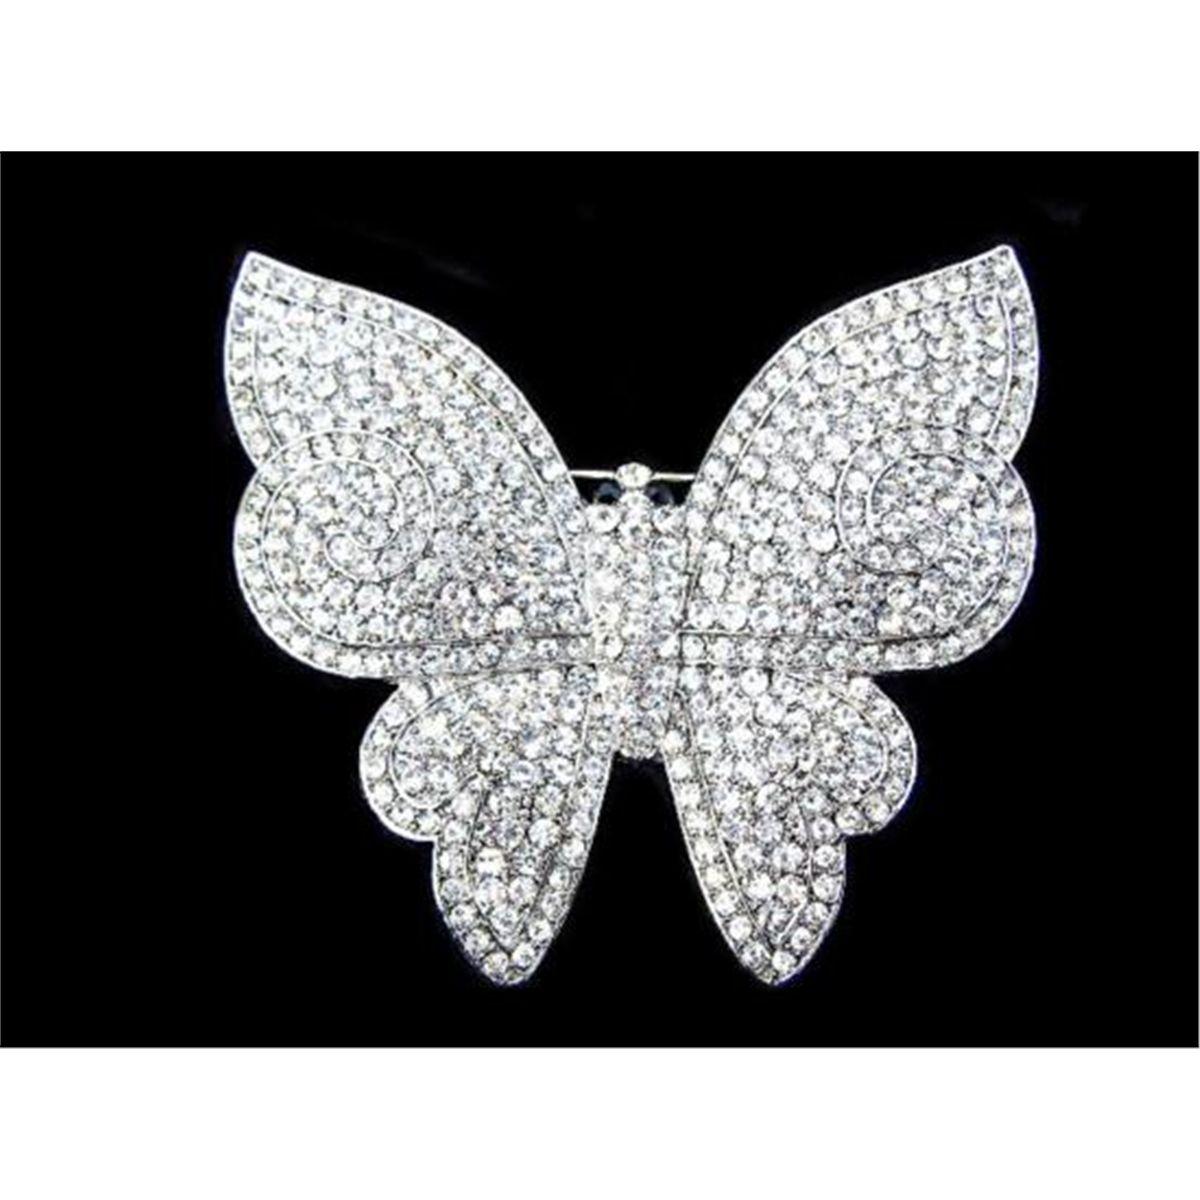 Swarovski Crystal Butterfly Brooch Pin